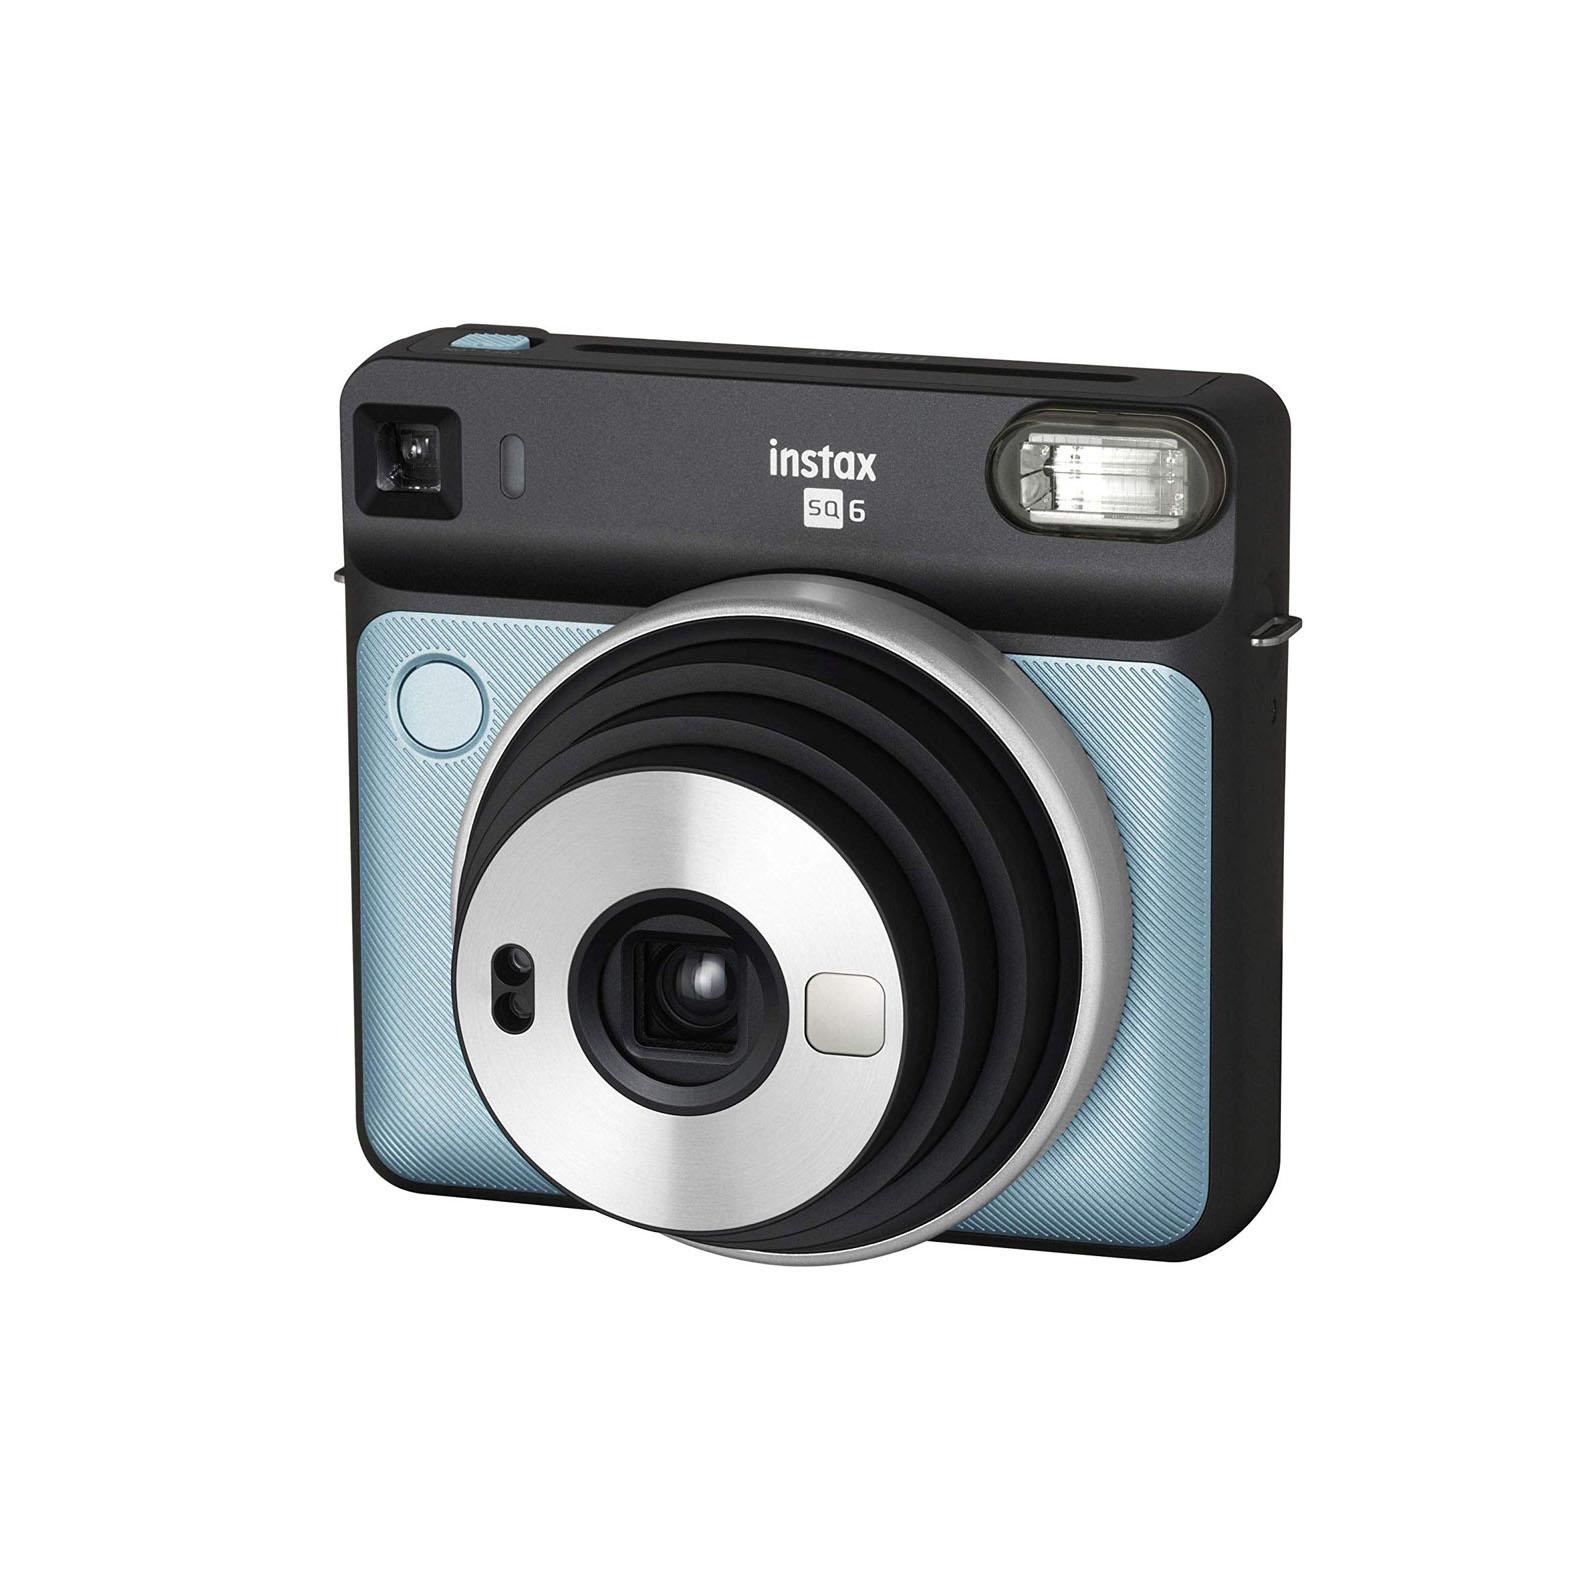 دوربین چاپ سریع دیجیتال فوجی Instax SQ6 (آبی)